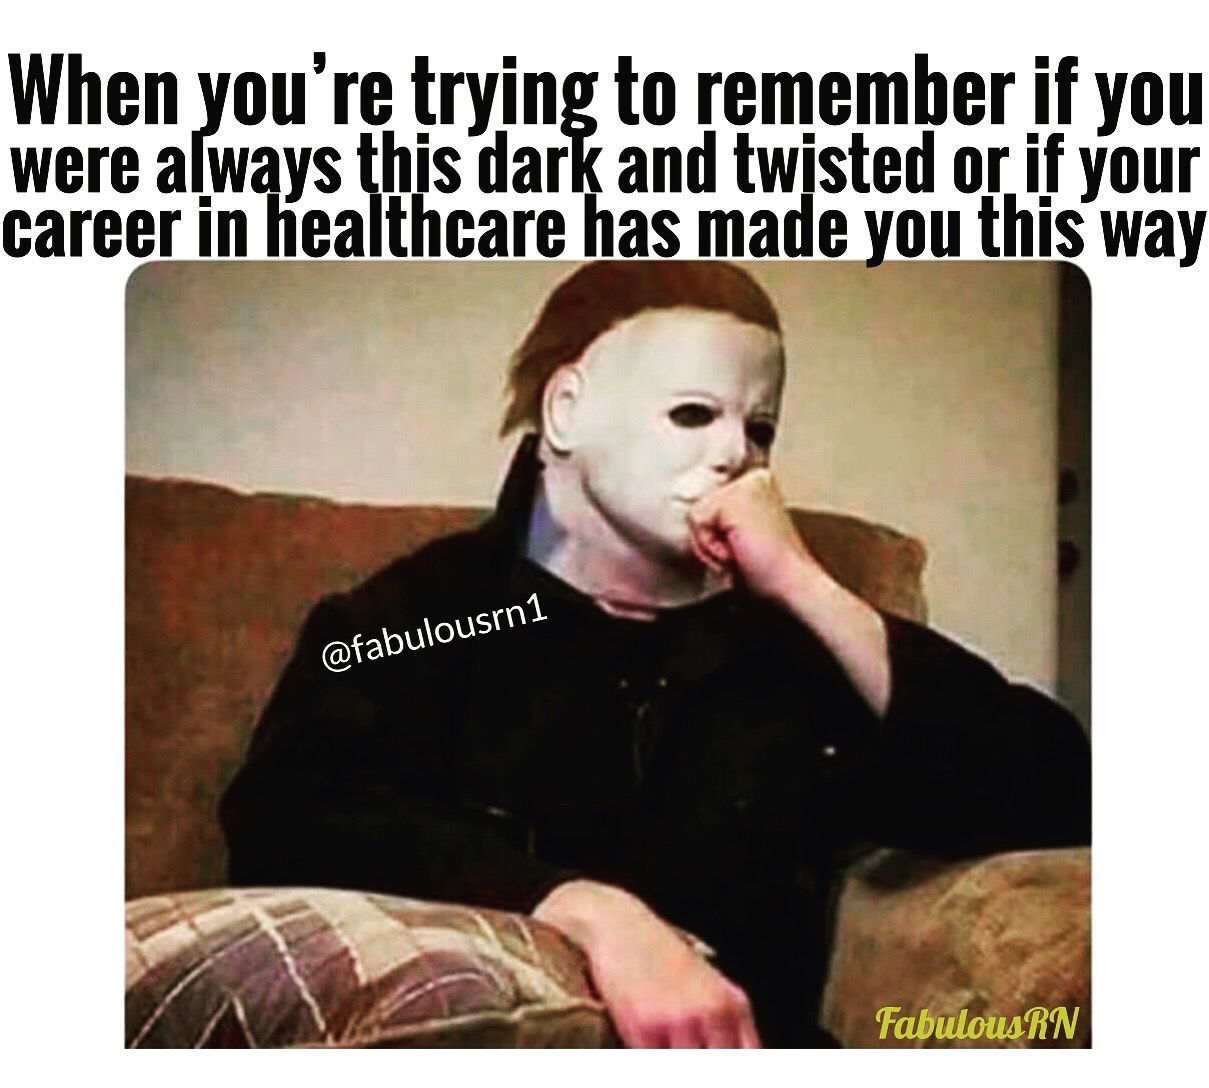 Nurse Humor Nursing Funny Meme Fabulousrn Nurse Humor Nursing Funny Meme Fabulousrn Comicbooks Comicsandcartoons In 2020 Nurse Memes Humor Nurse Jokes Rn Humor